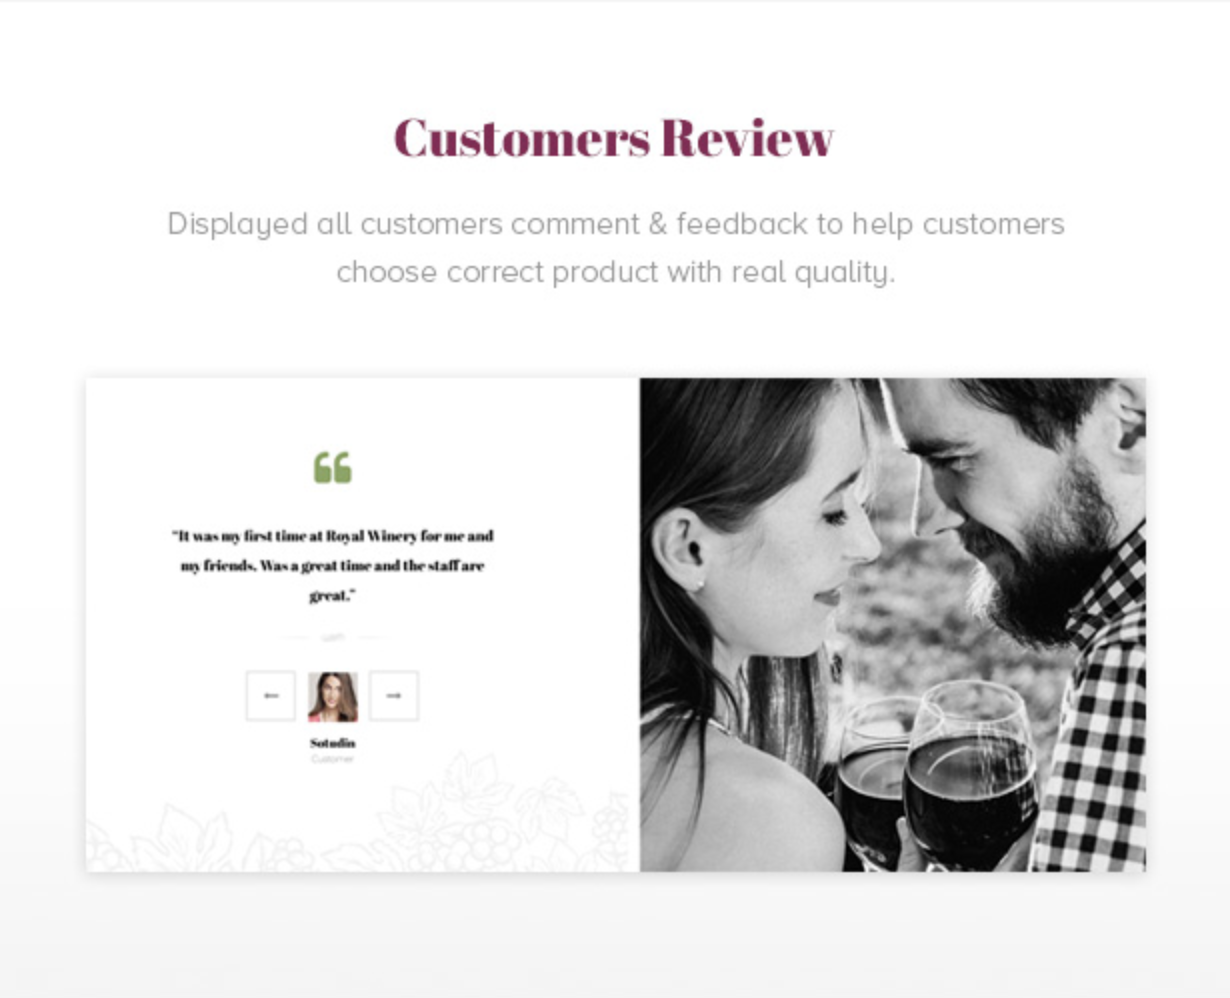 Royanwine Customer Reviews for Vinyard, Winery, Wine Makers, Dairy Farm